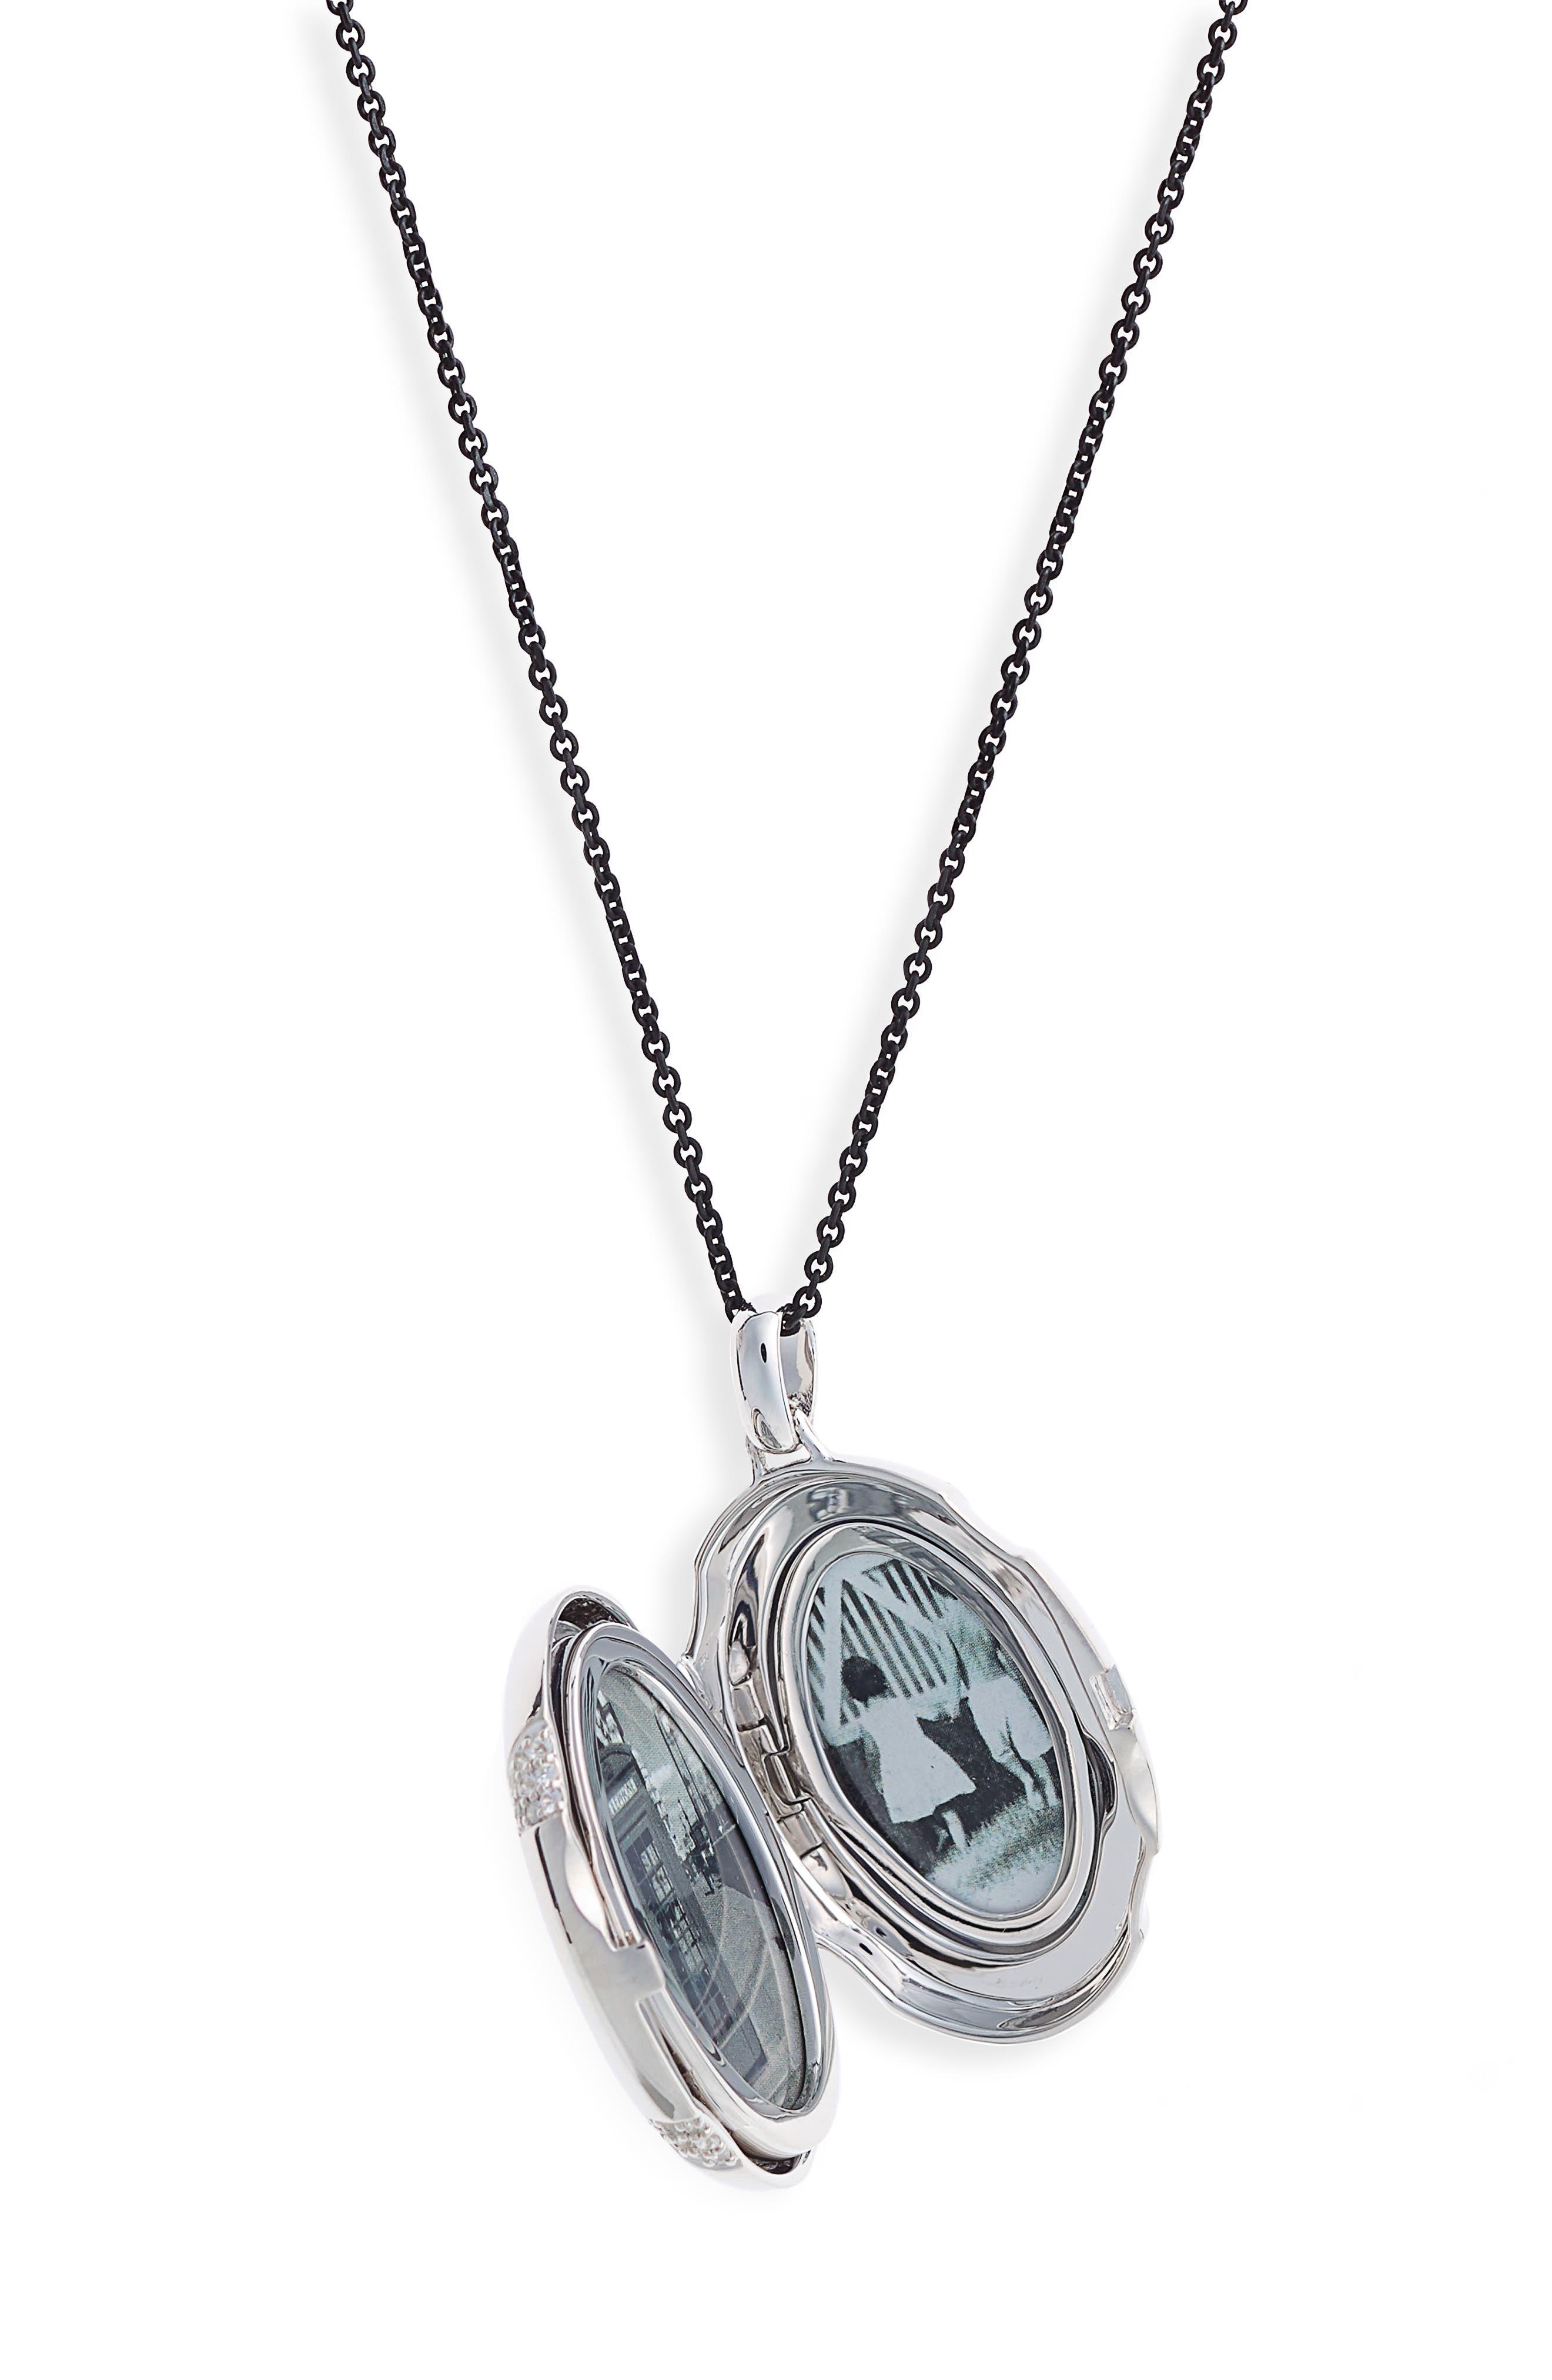 4-Image Locket Necklace,                             Alternate thumbnail 2, color,                             Sterling Silver